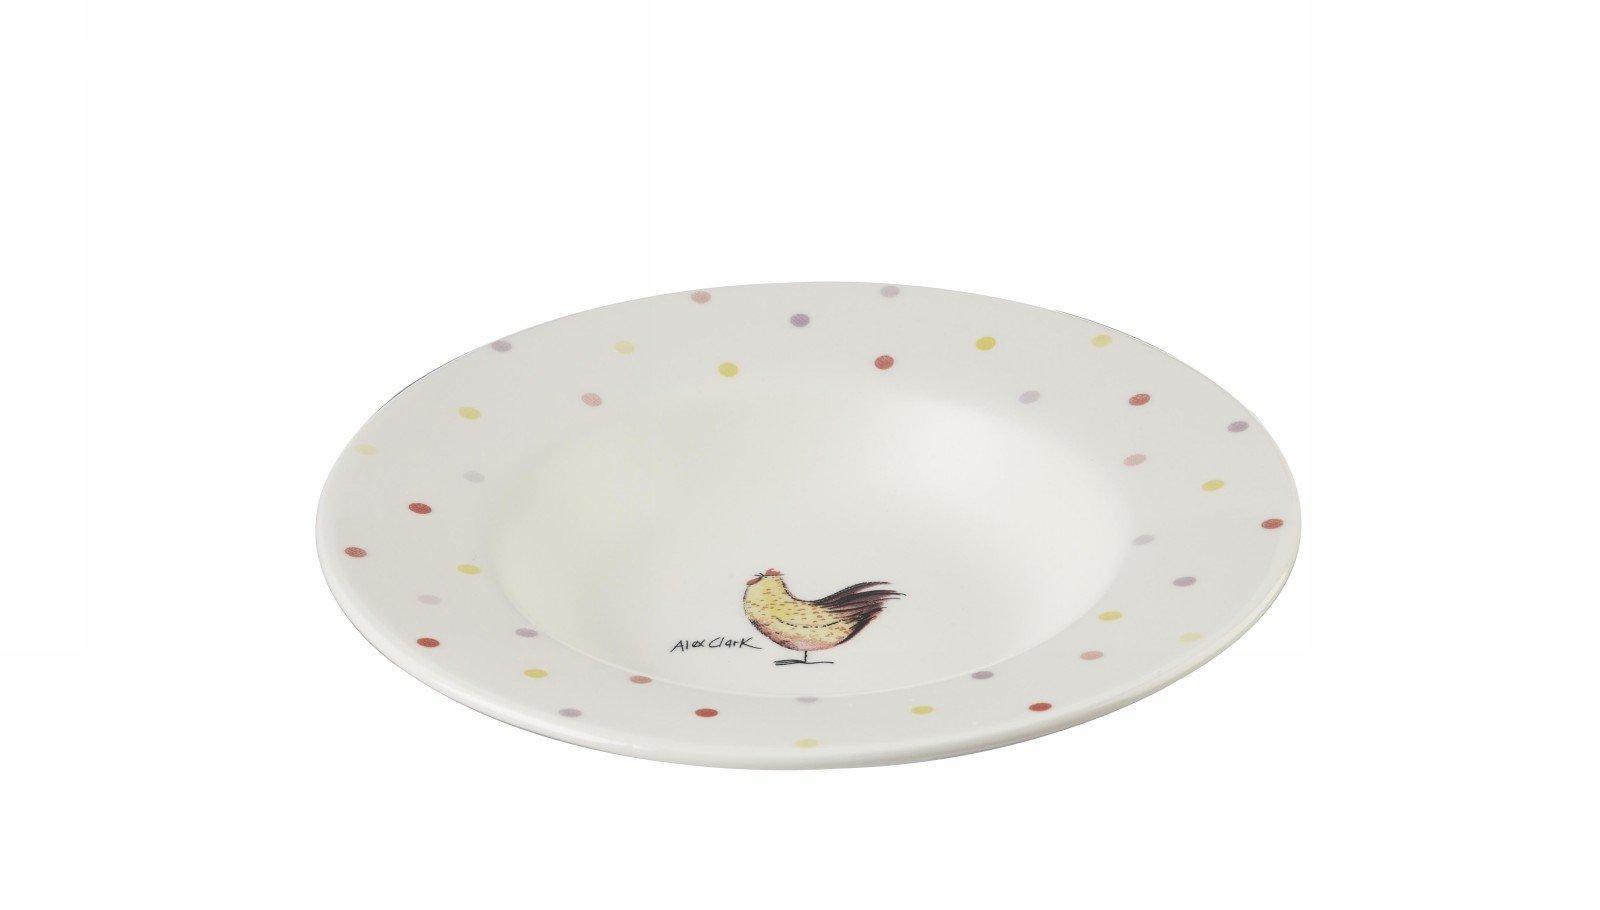 Тарелка для супа 22 см Churchill Петухи от Алекс Кларк